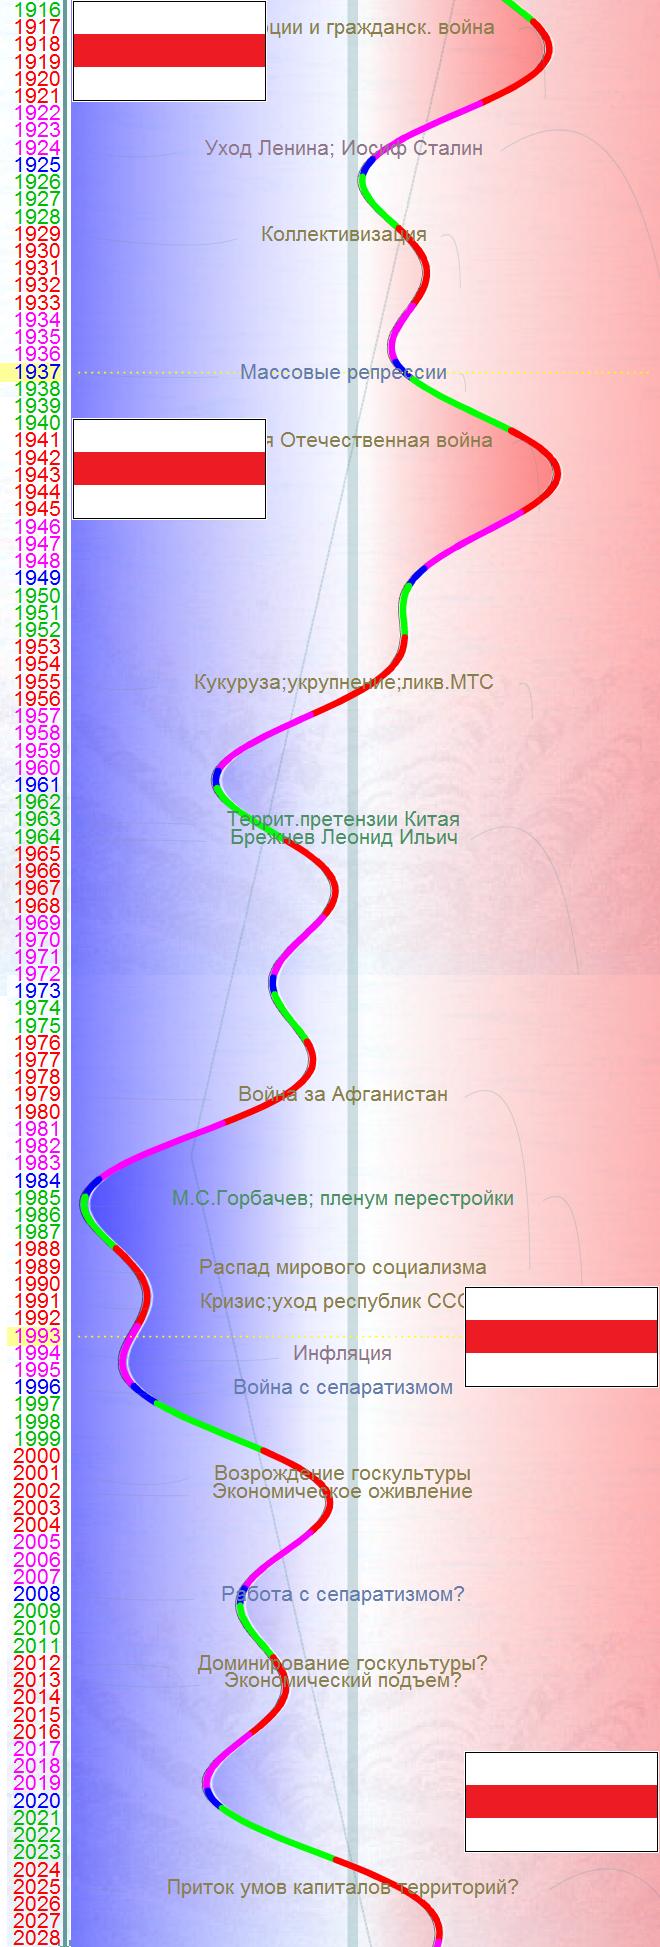 бело-красно-белый флаг Беларуси